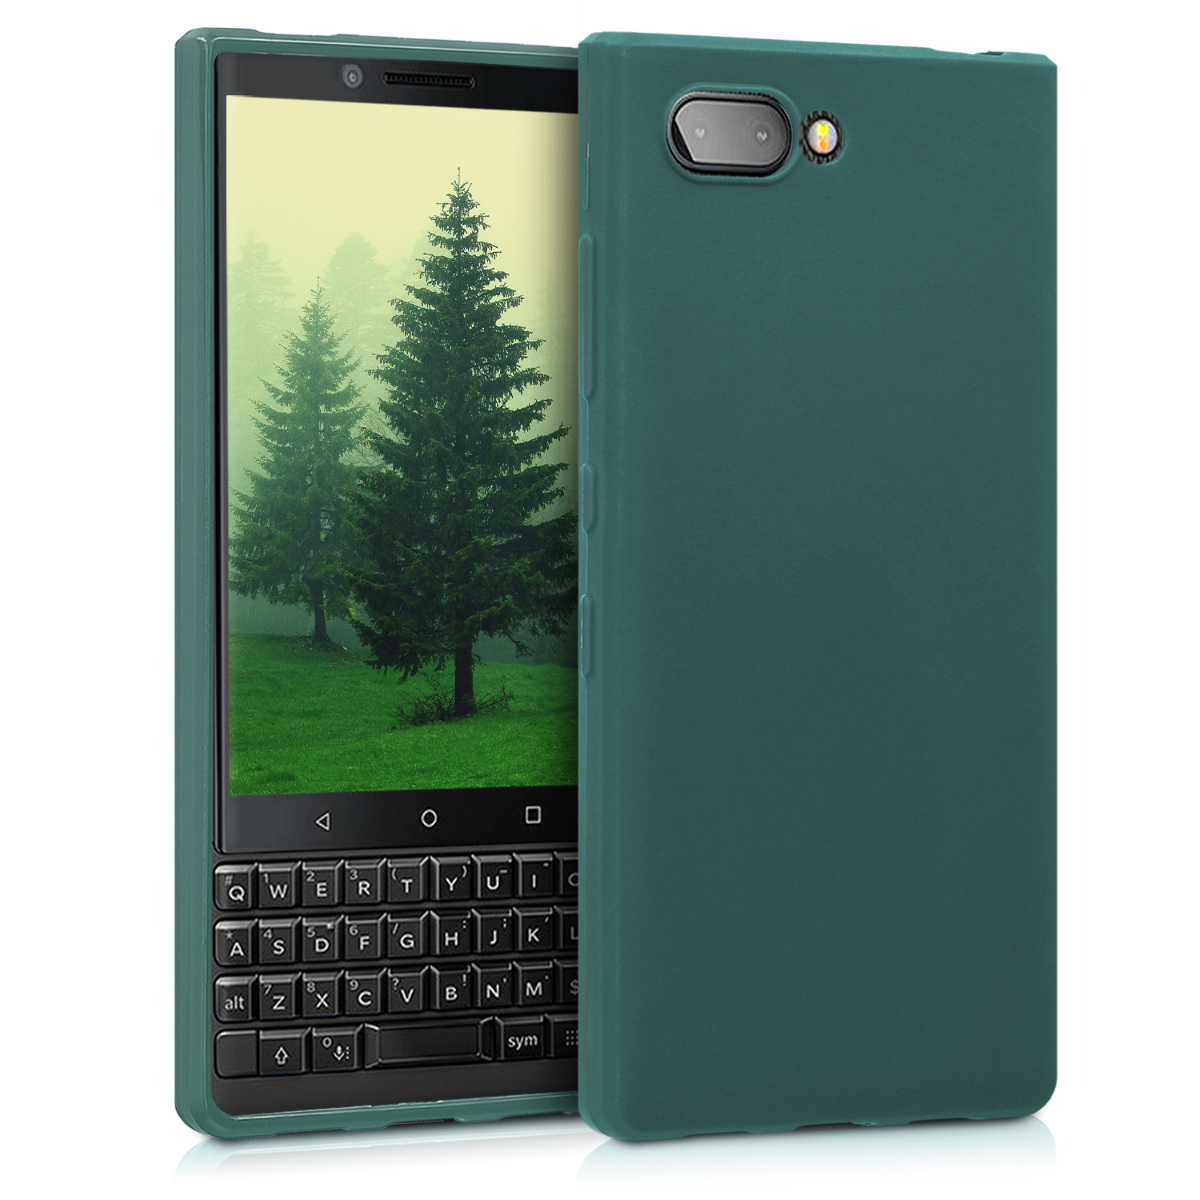 KW Θήκη Σιλικόνης Blackberry KEY2 - Dark Green Matte (45435.118)